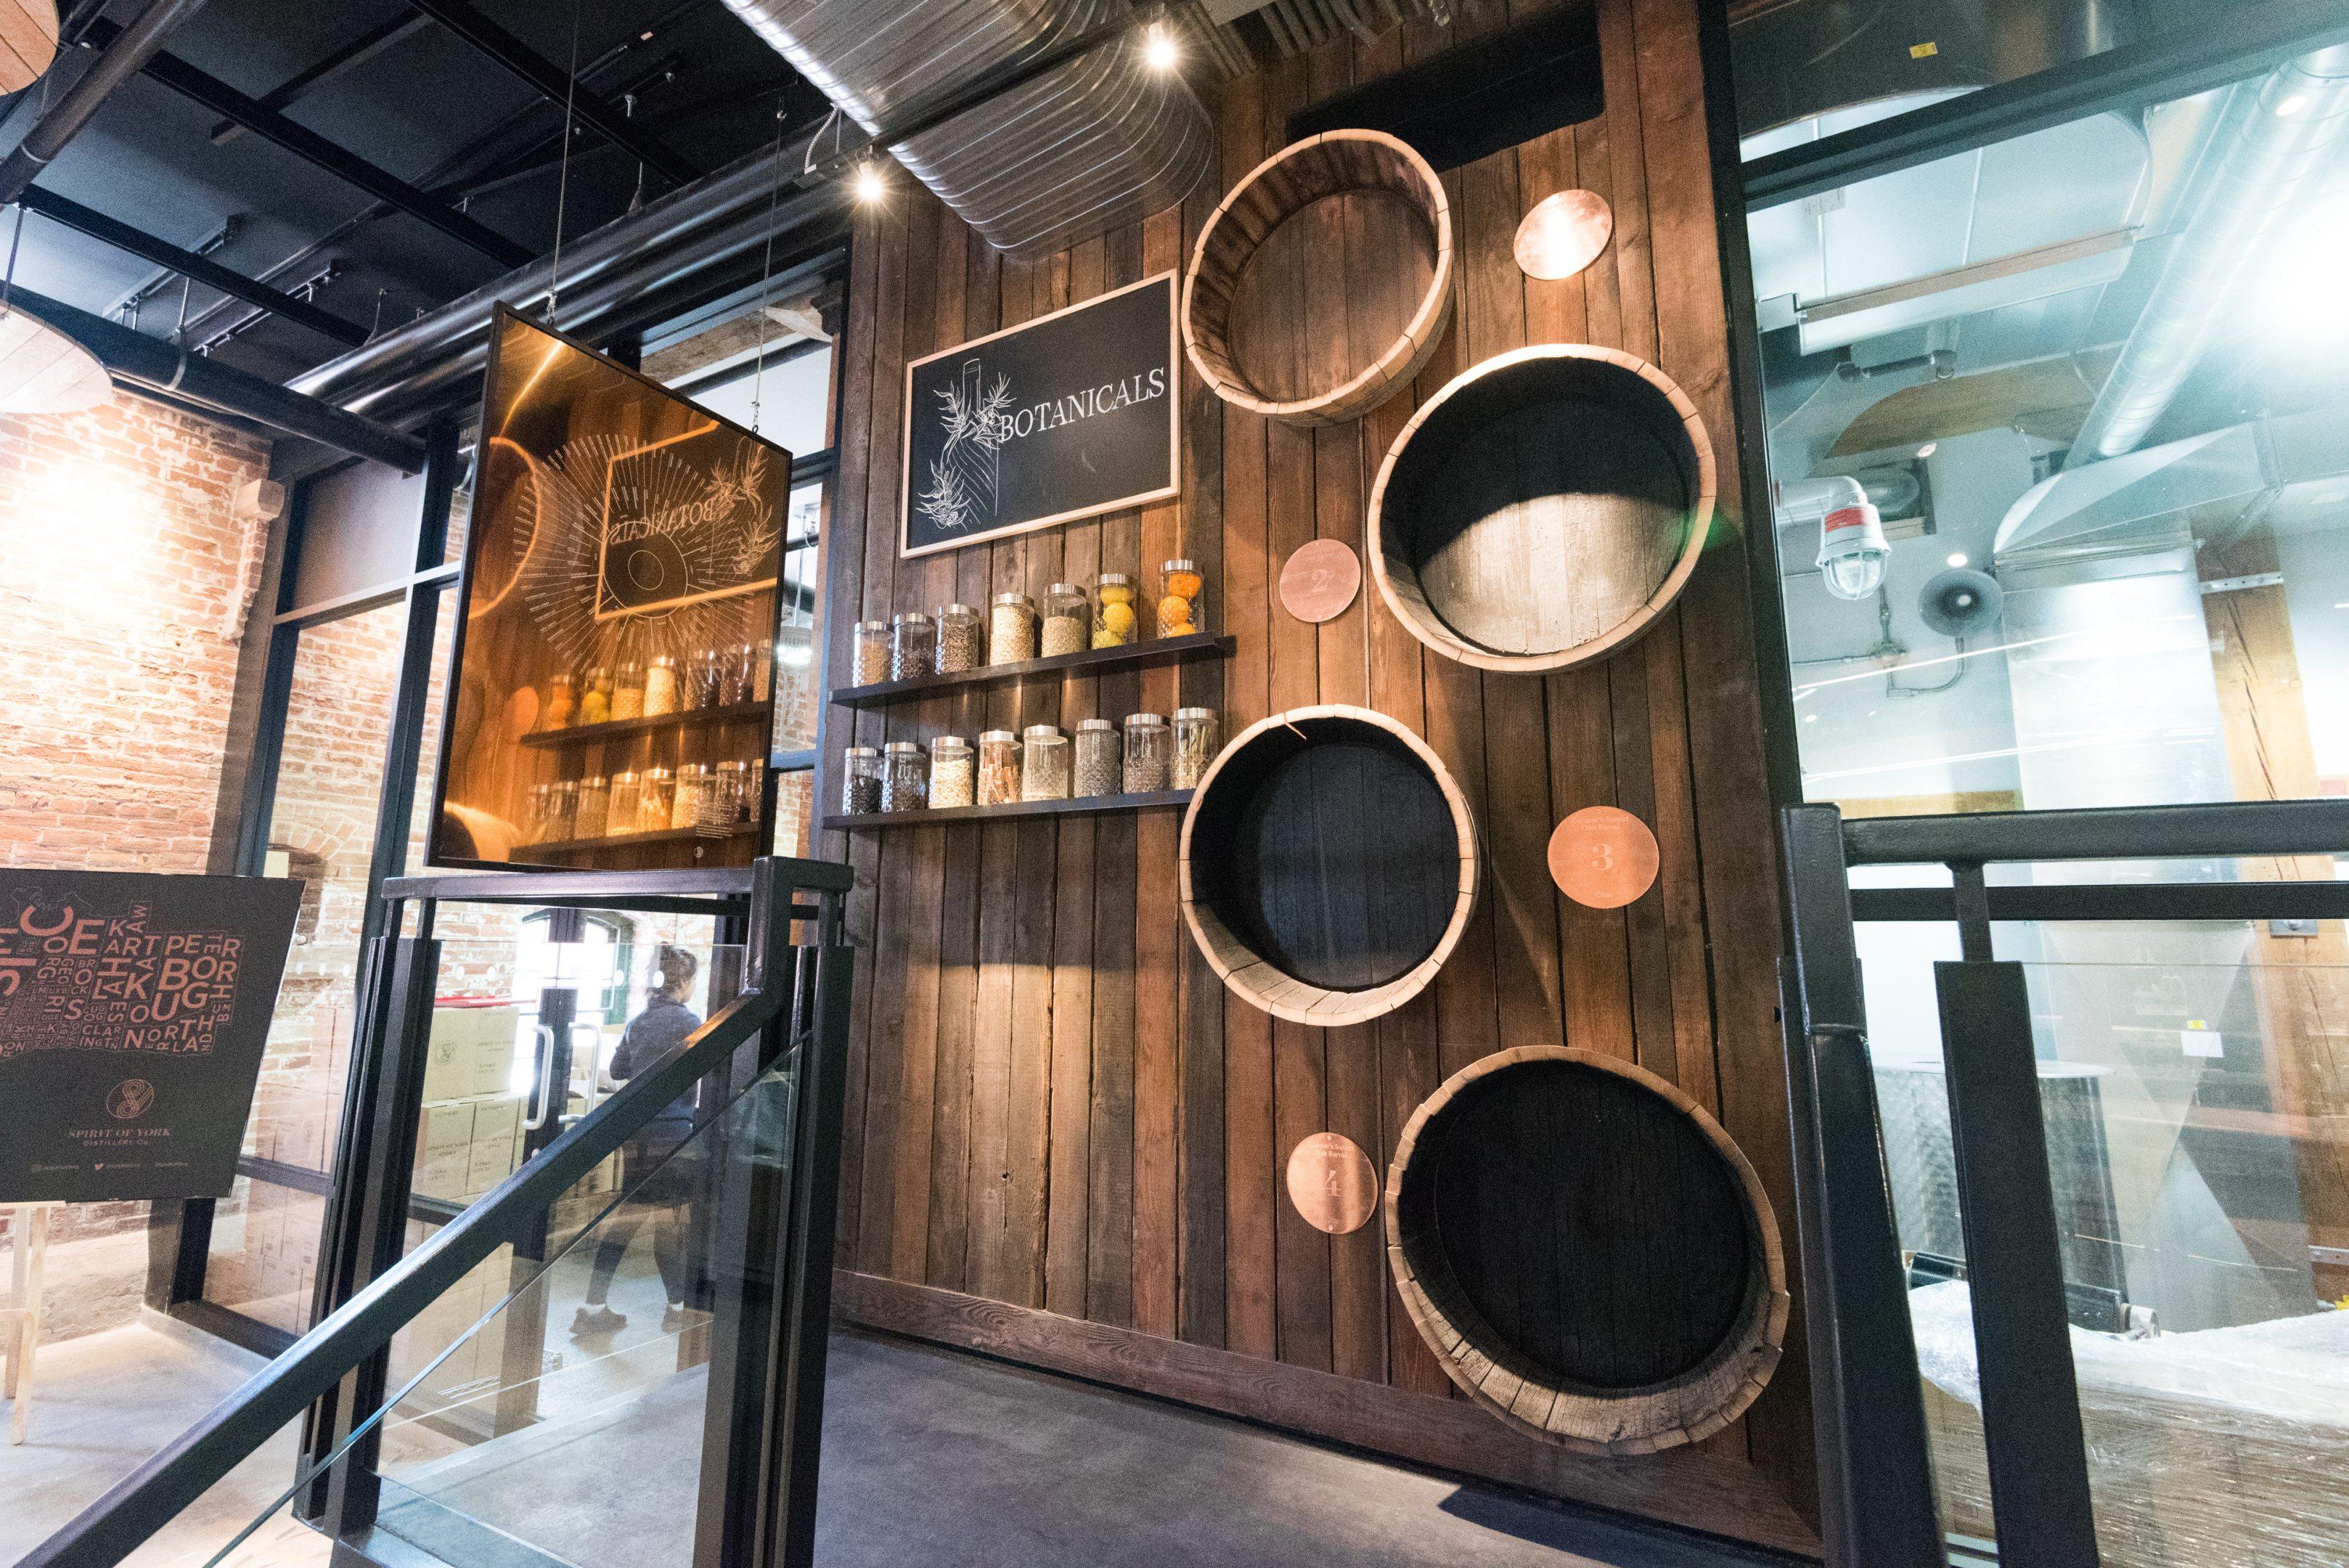 toronto-bars-spirit-of-york-distillery-co-distillery-district-botanicals